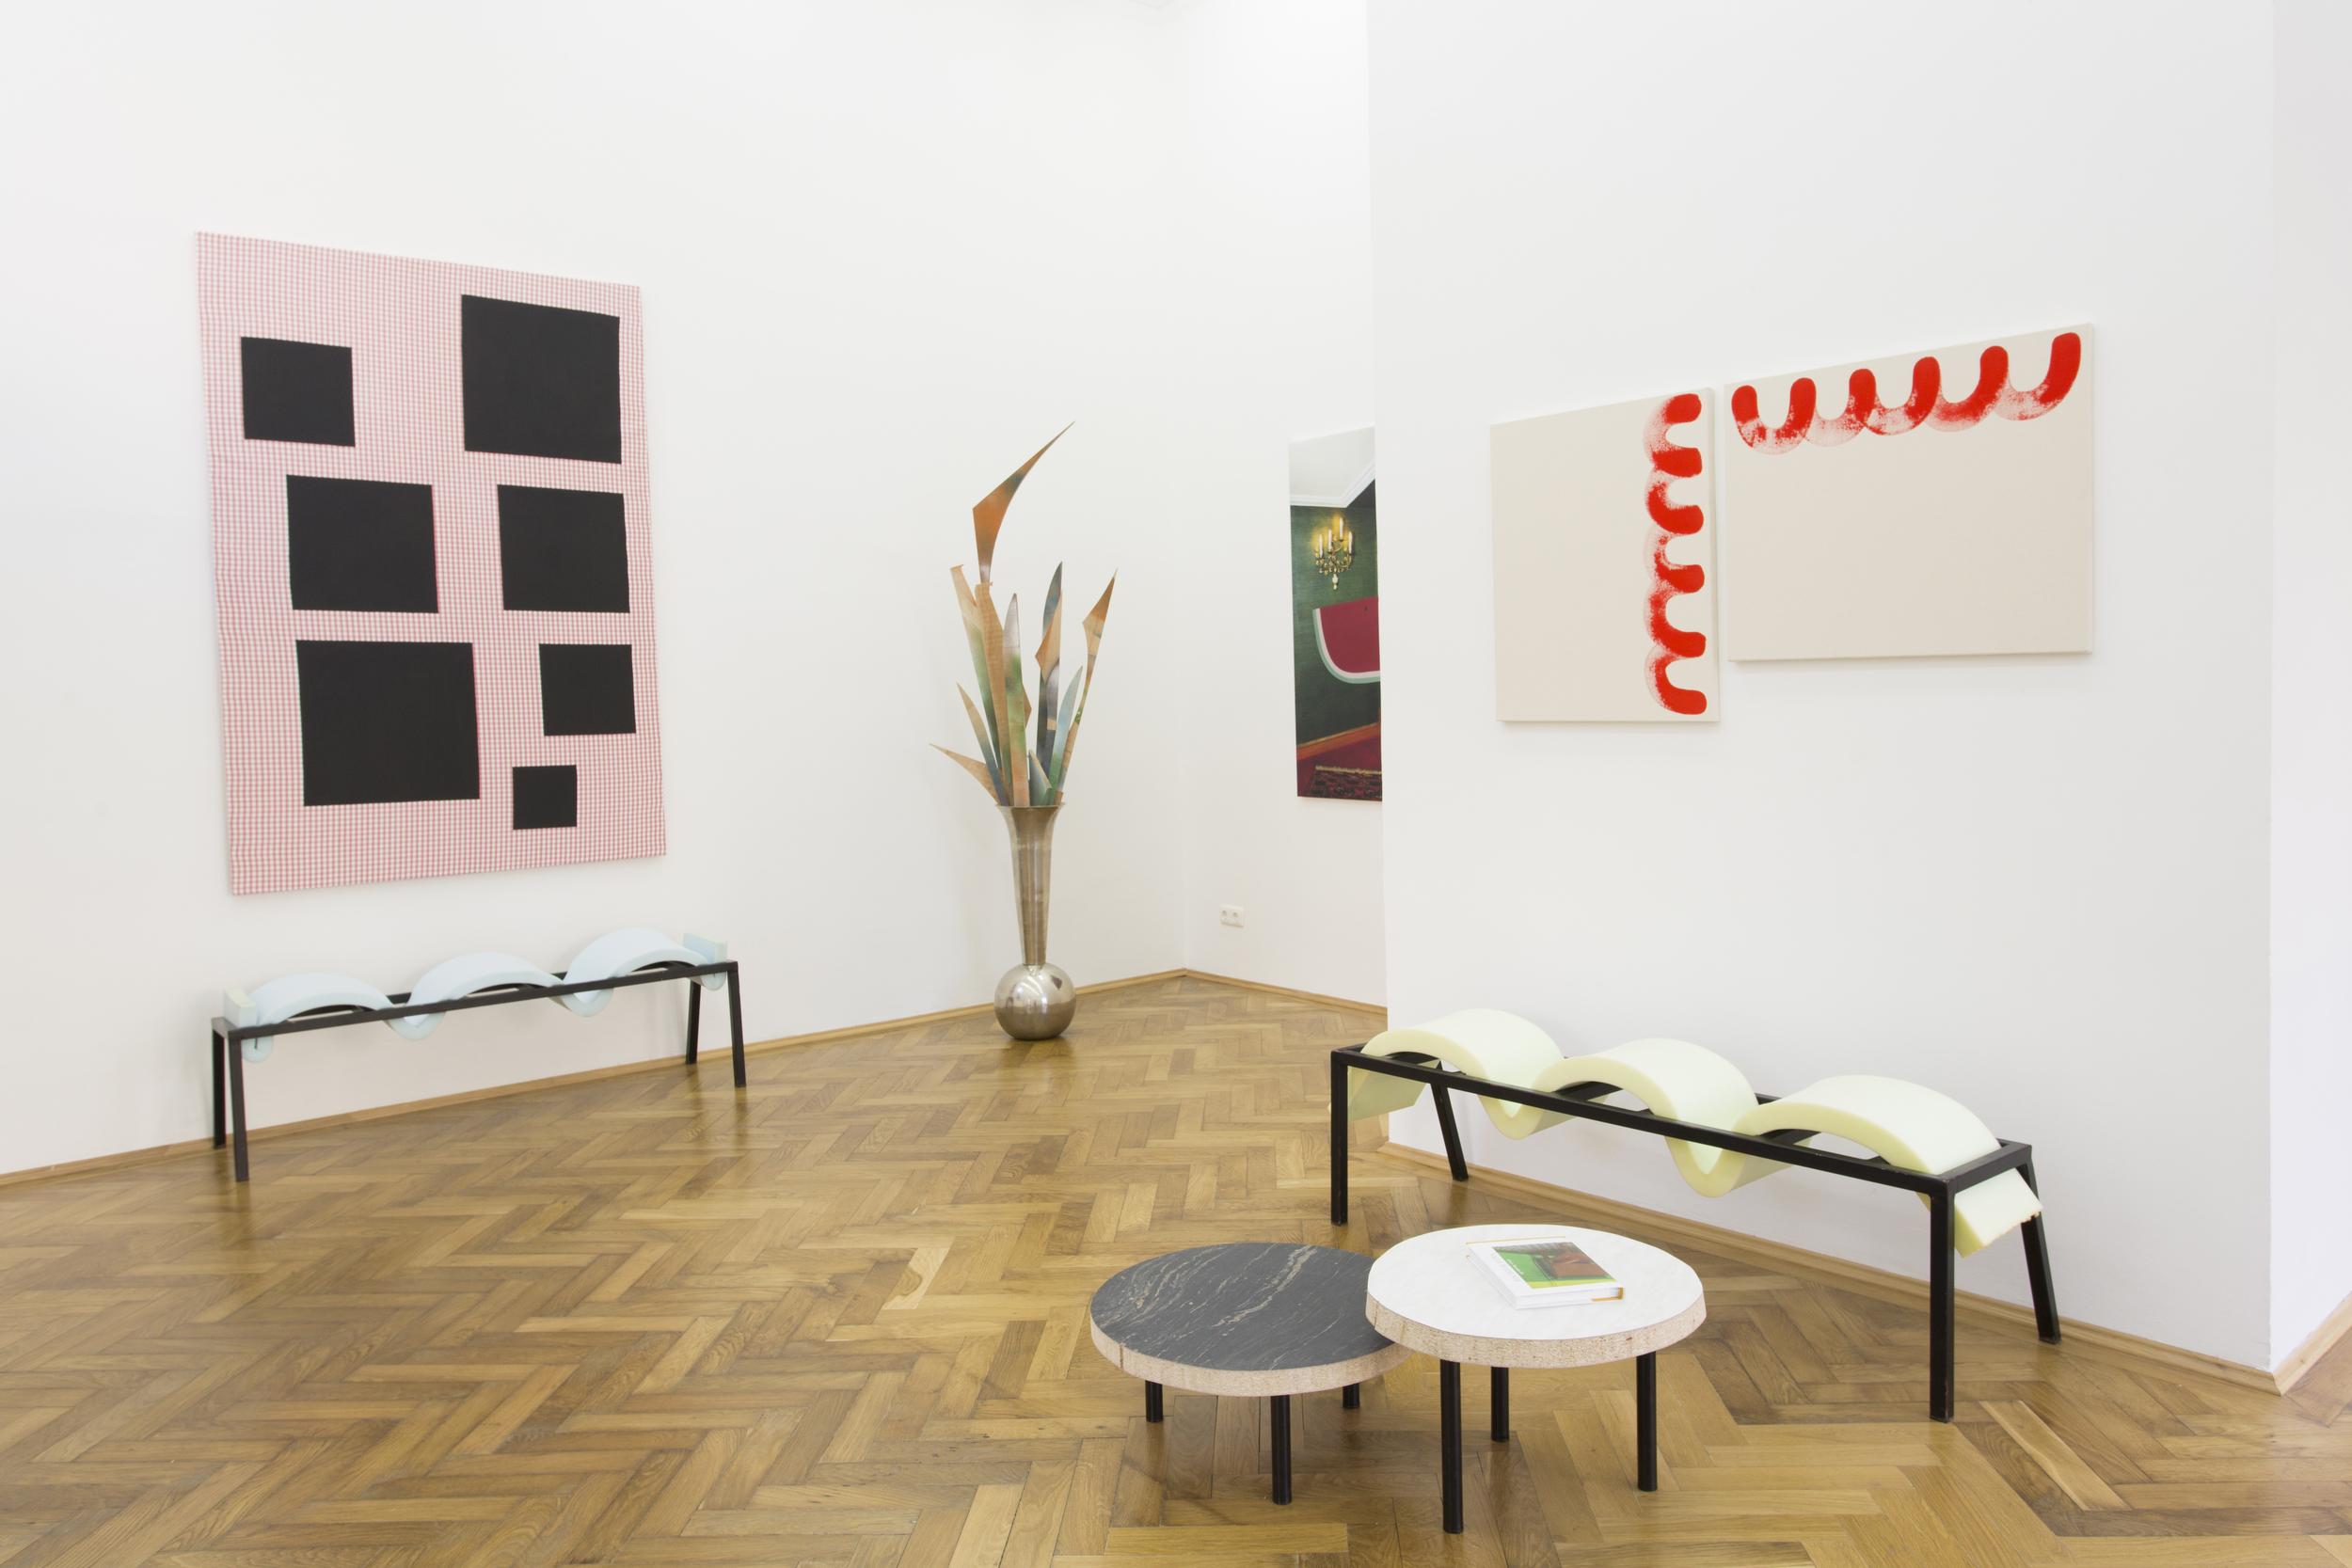 Elvire Bonduelle - waiting room #4 - installation view (Nicolas Chardon, Émile Vappereau, Amedeo Polazzo, Elvire Bonduelle)